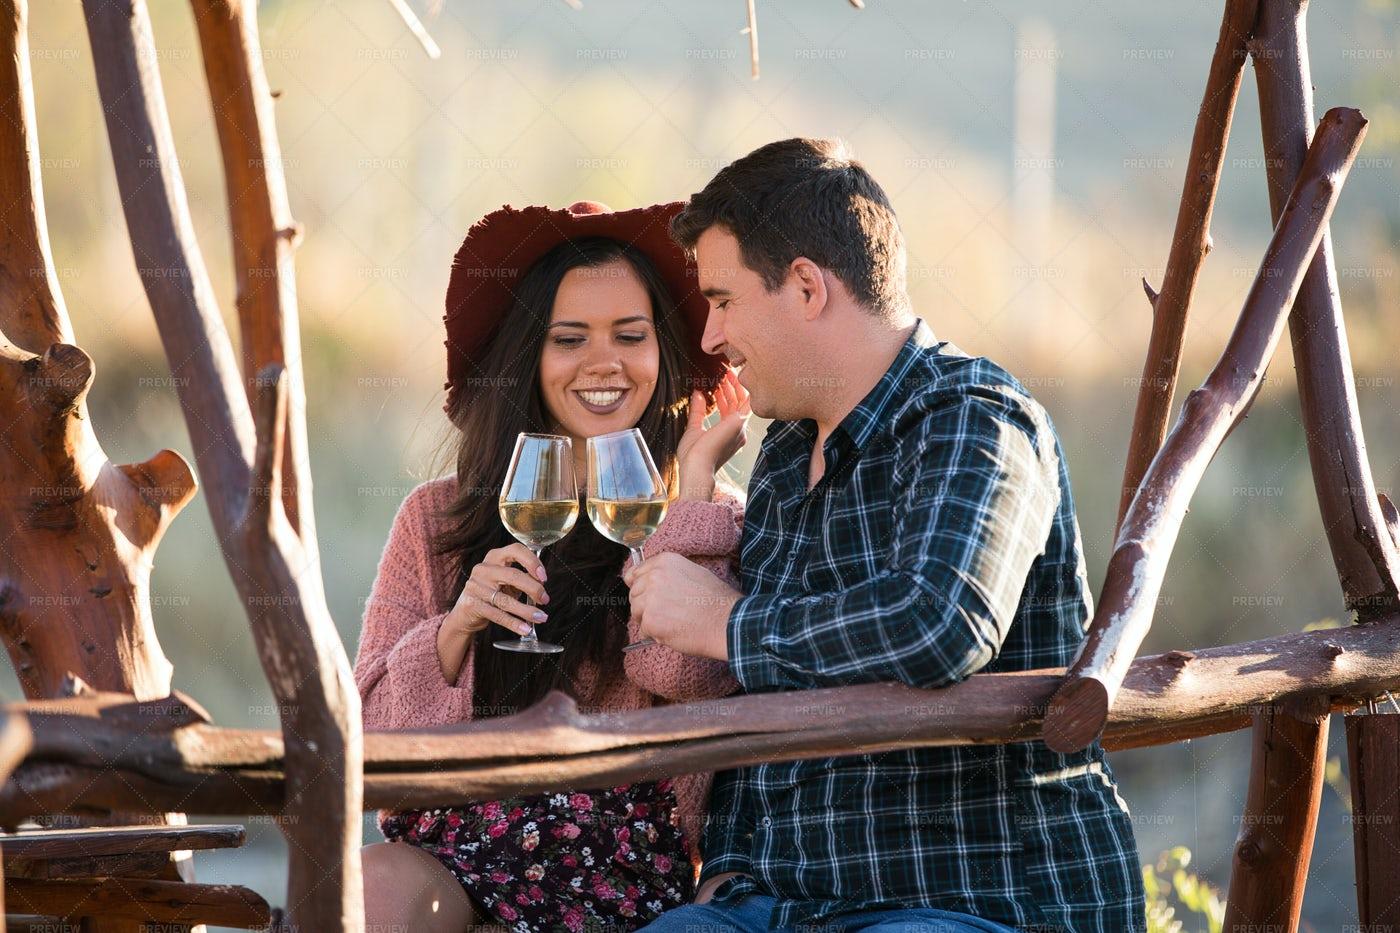 Couple Sitting On A Wooden Pontont: Stock Photos